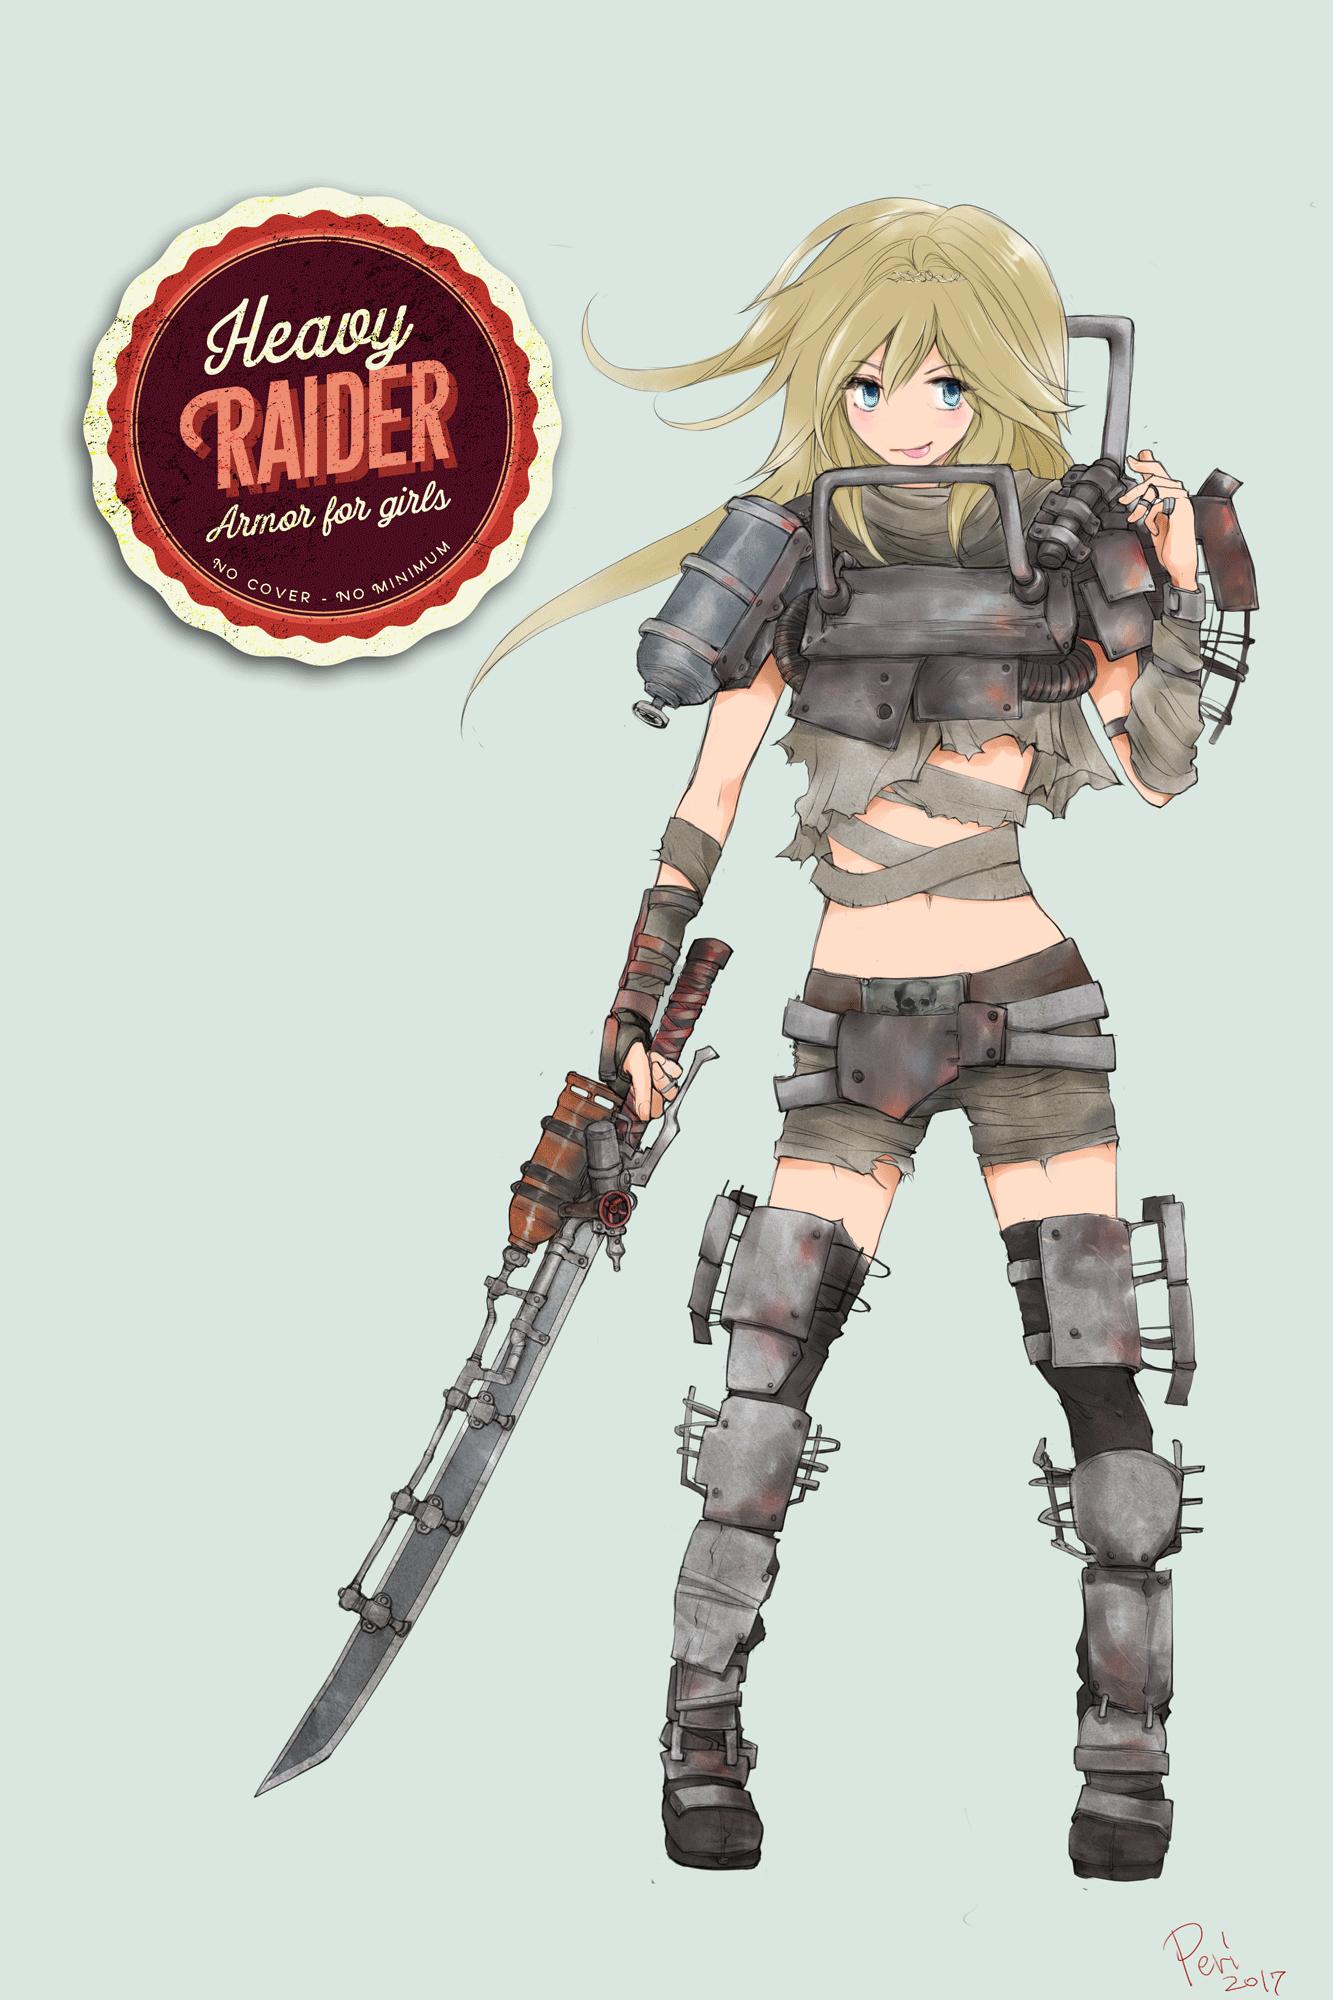 Fallout 4 Heavy Raider Armor For Girls Fallout Art Fallout Rpg Fallout Raider